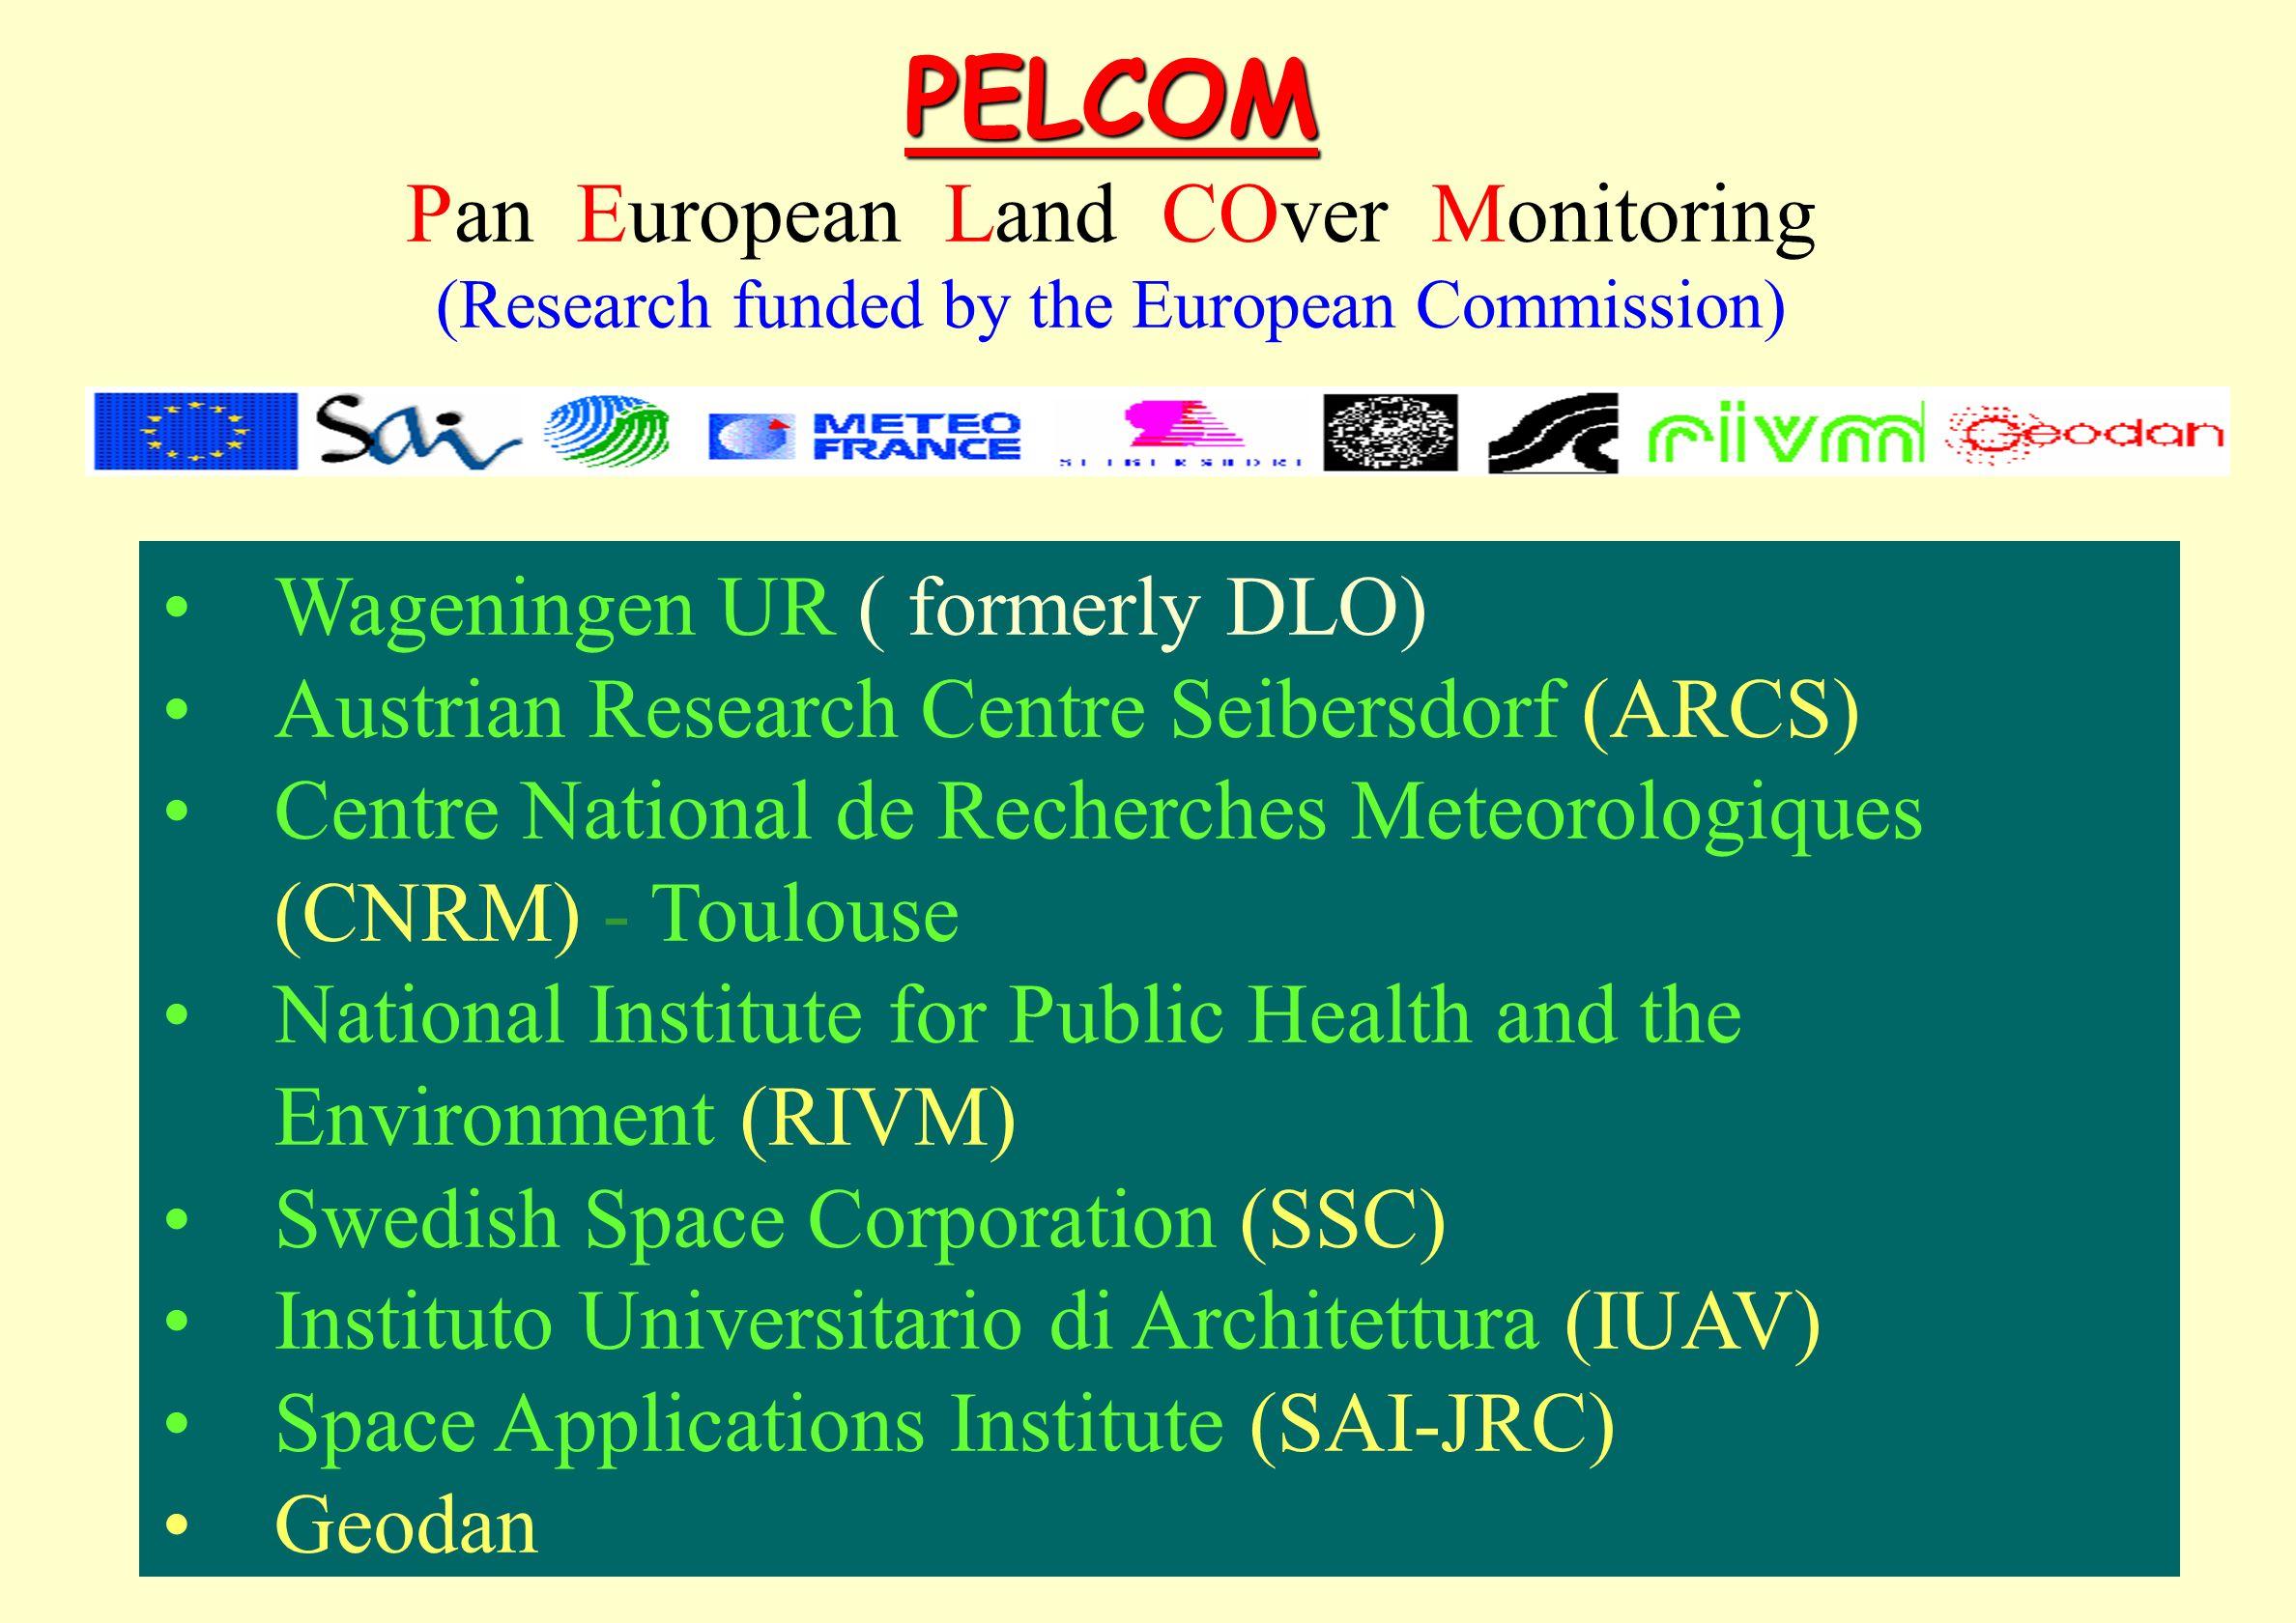 PELCOM Pan European Land COver Monitoring